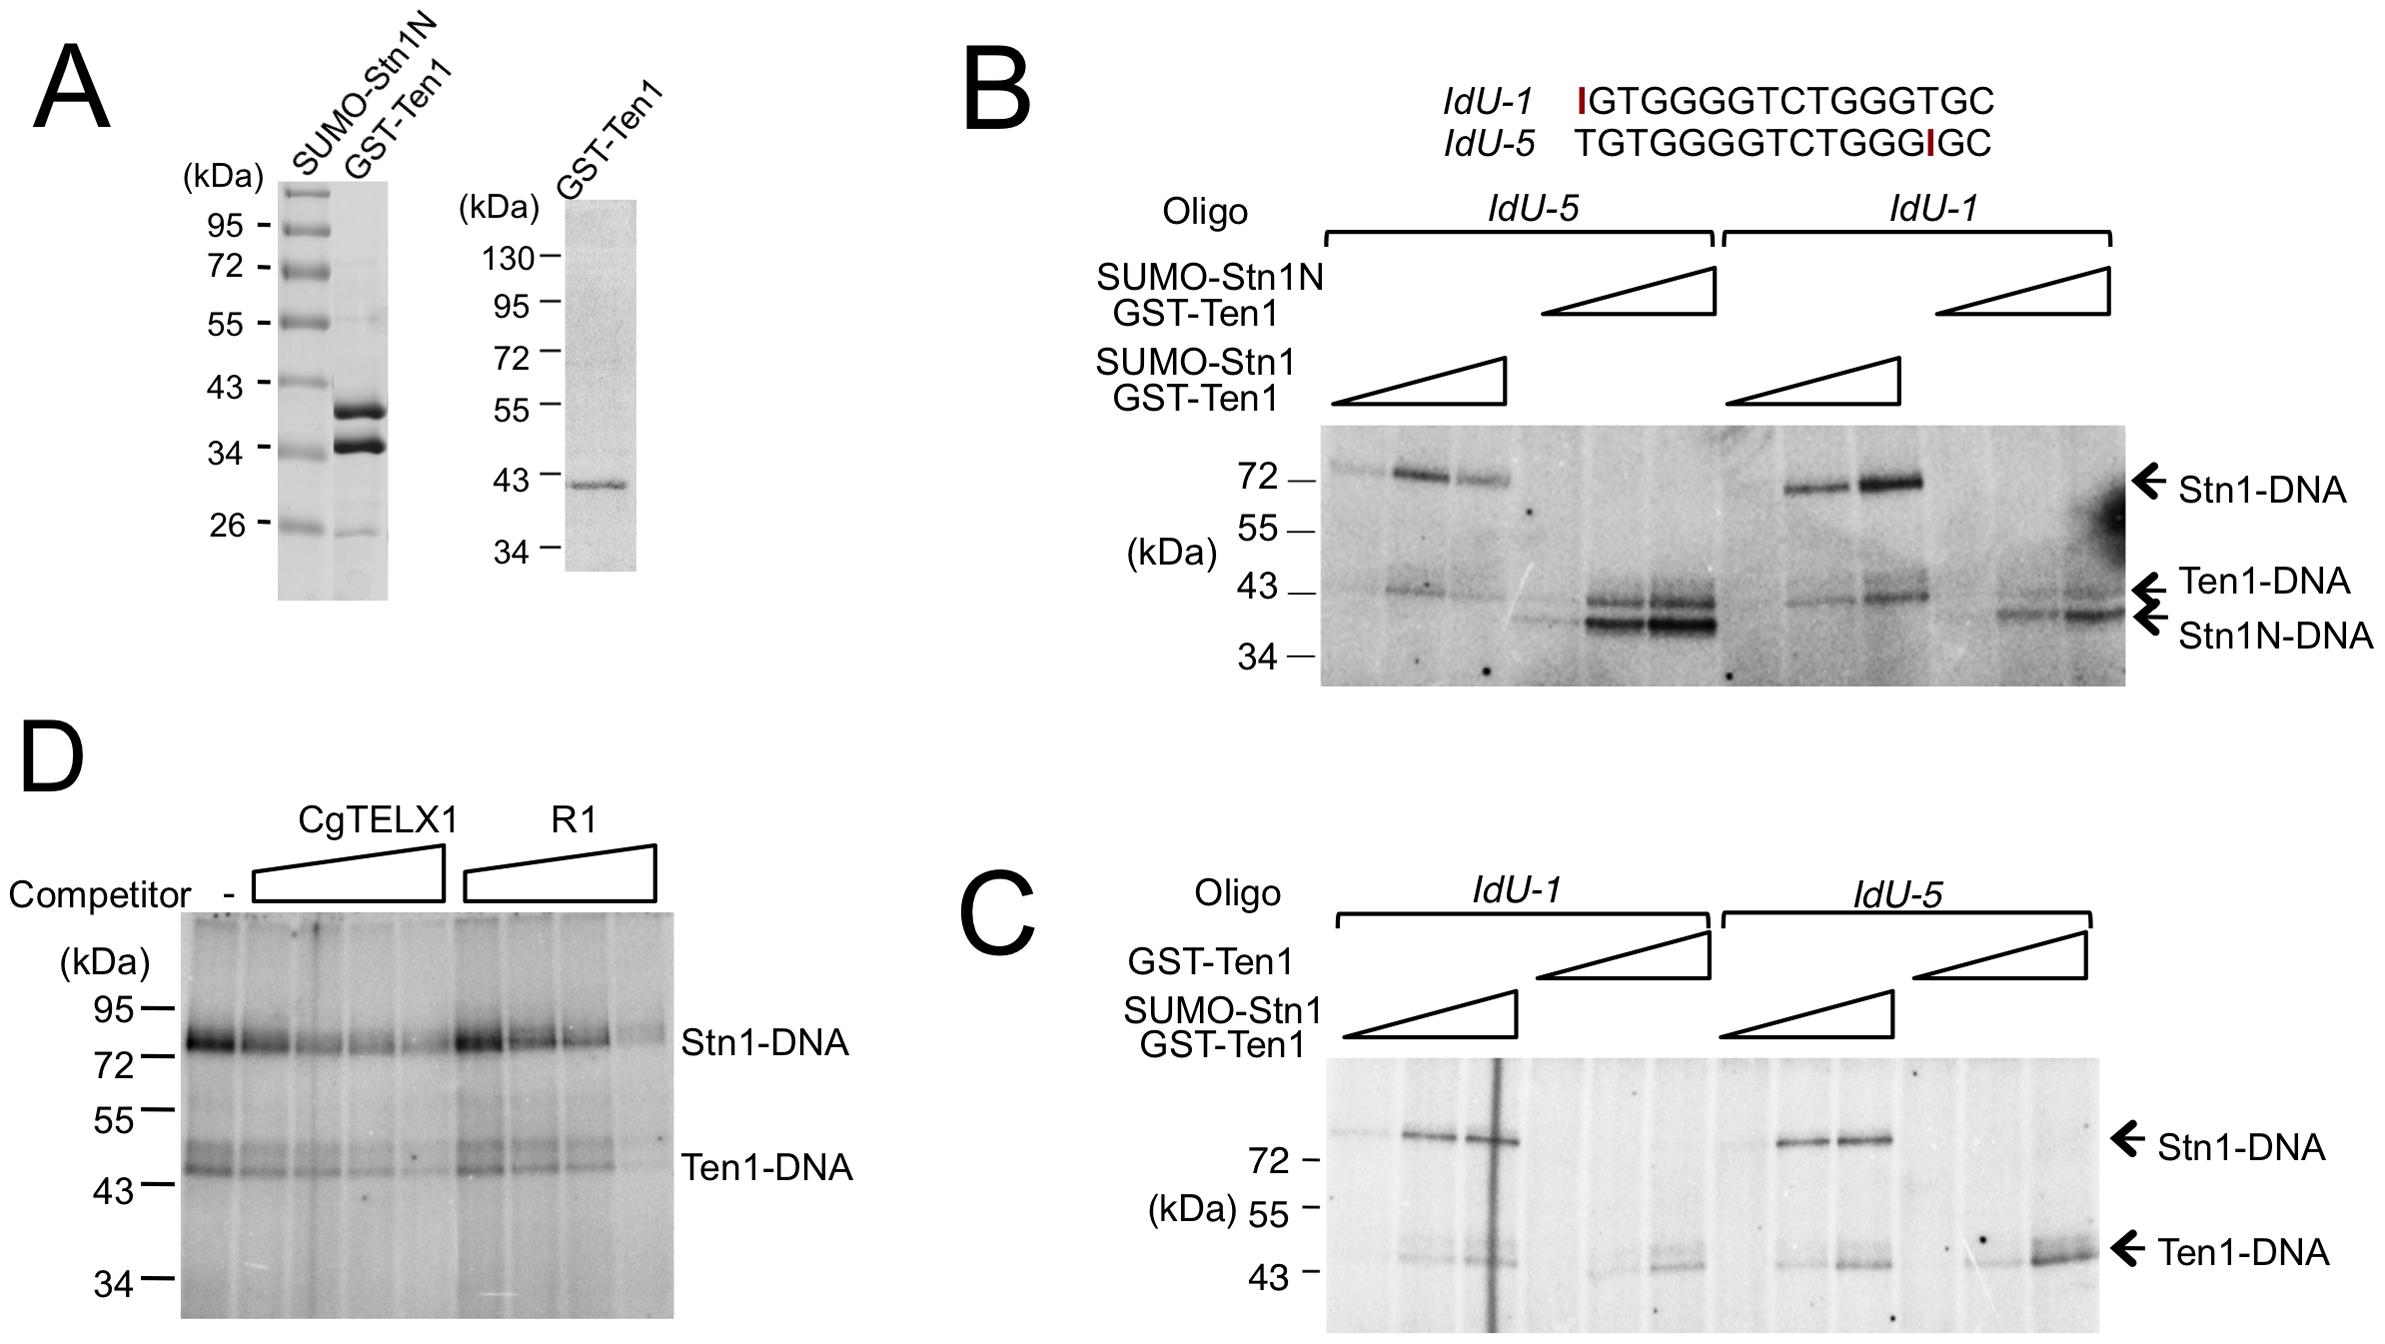 Crosslinking of <i>C. glabrata</i> Stn1 and Ten1 to photo-reactive telomere oligonucleotides.